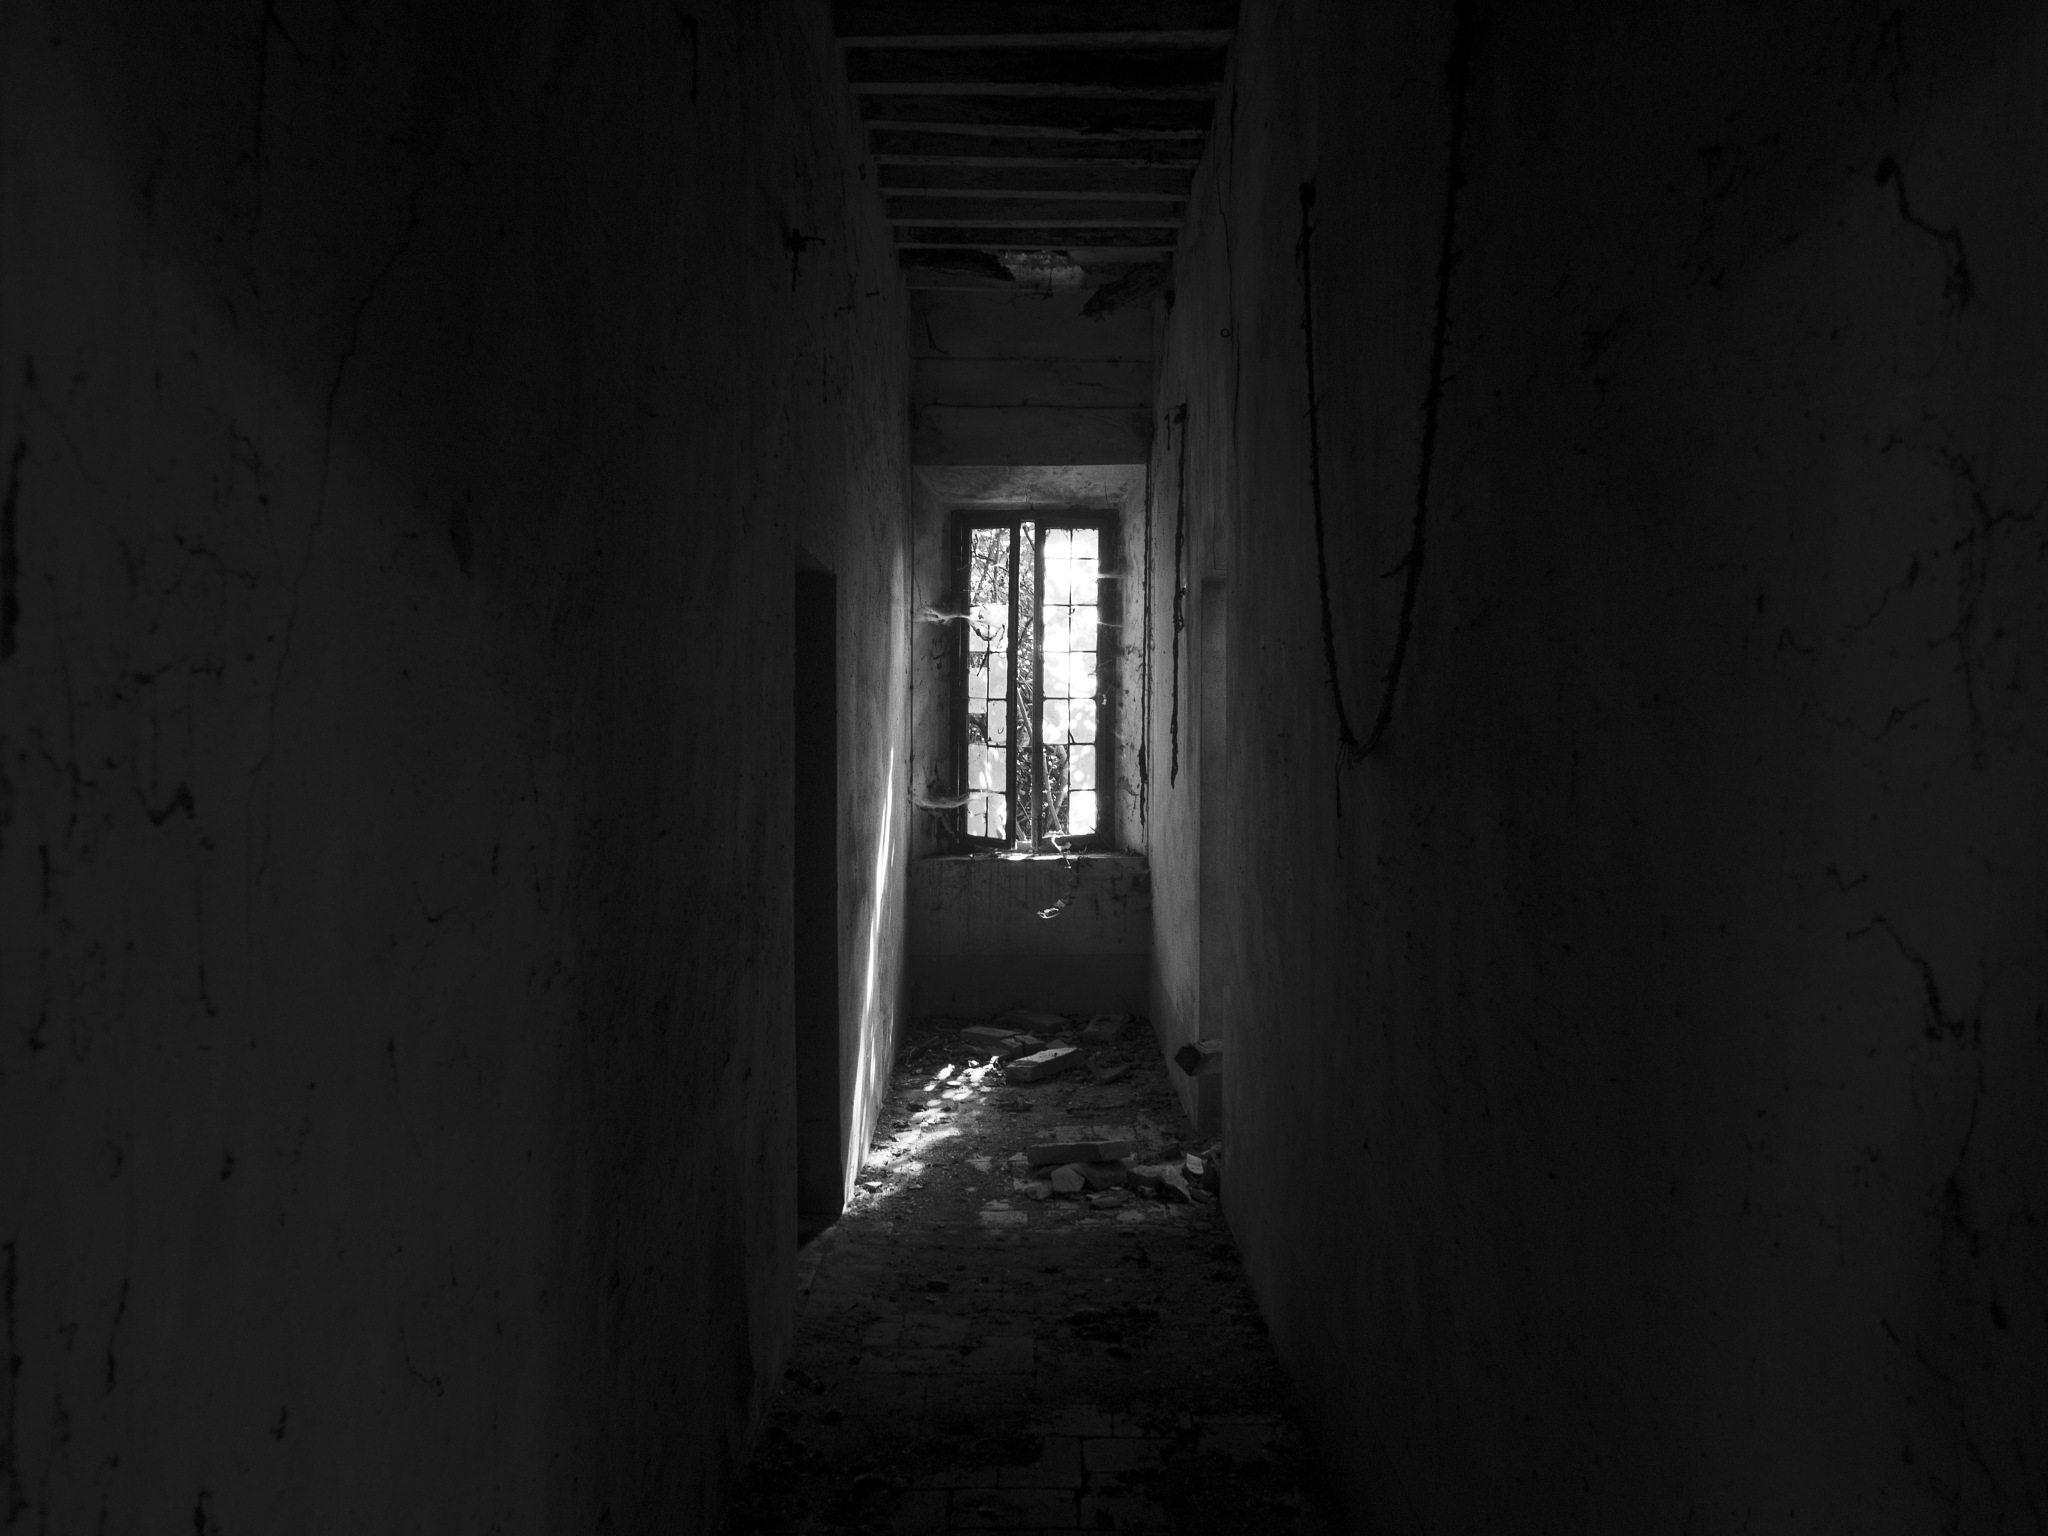 One more window by gabriele.zucchella